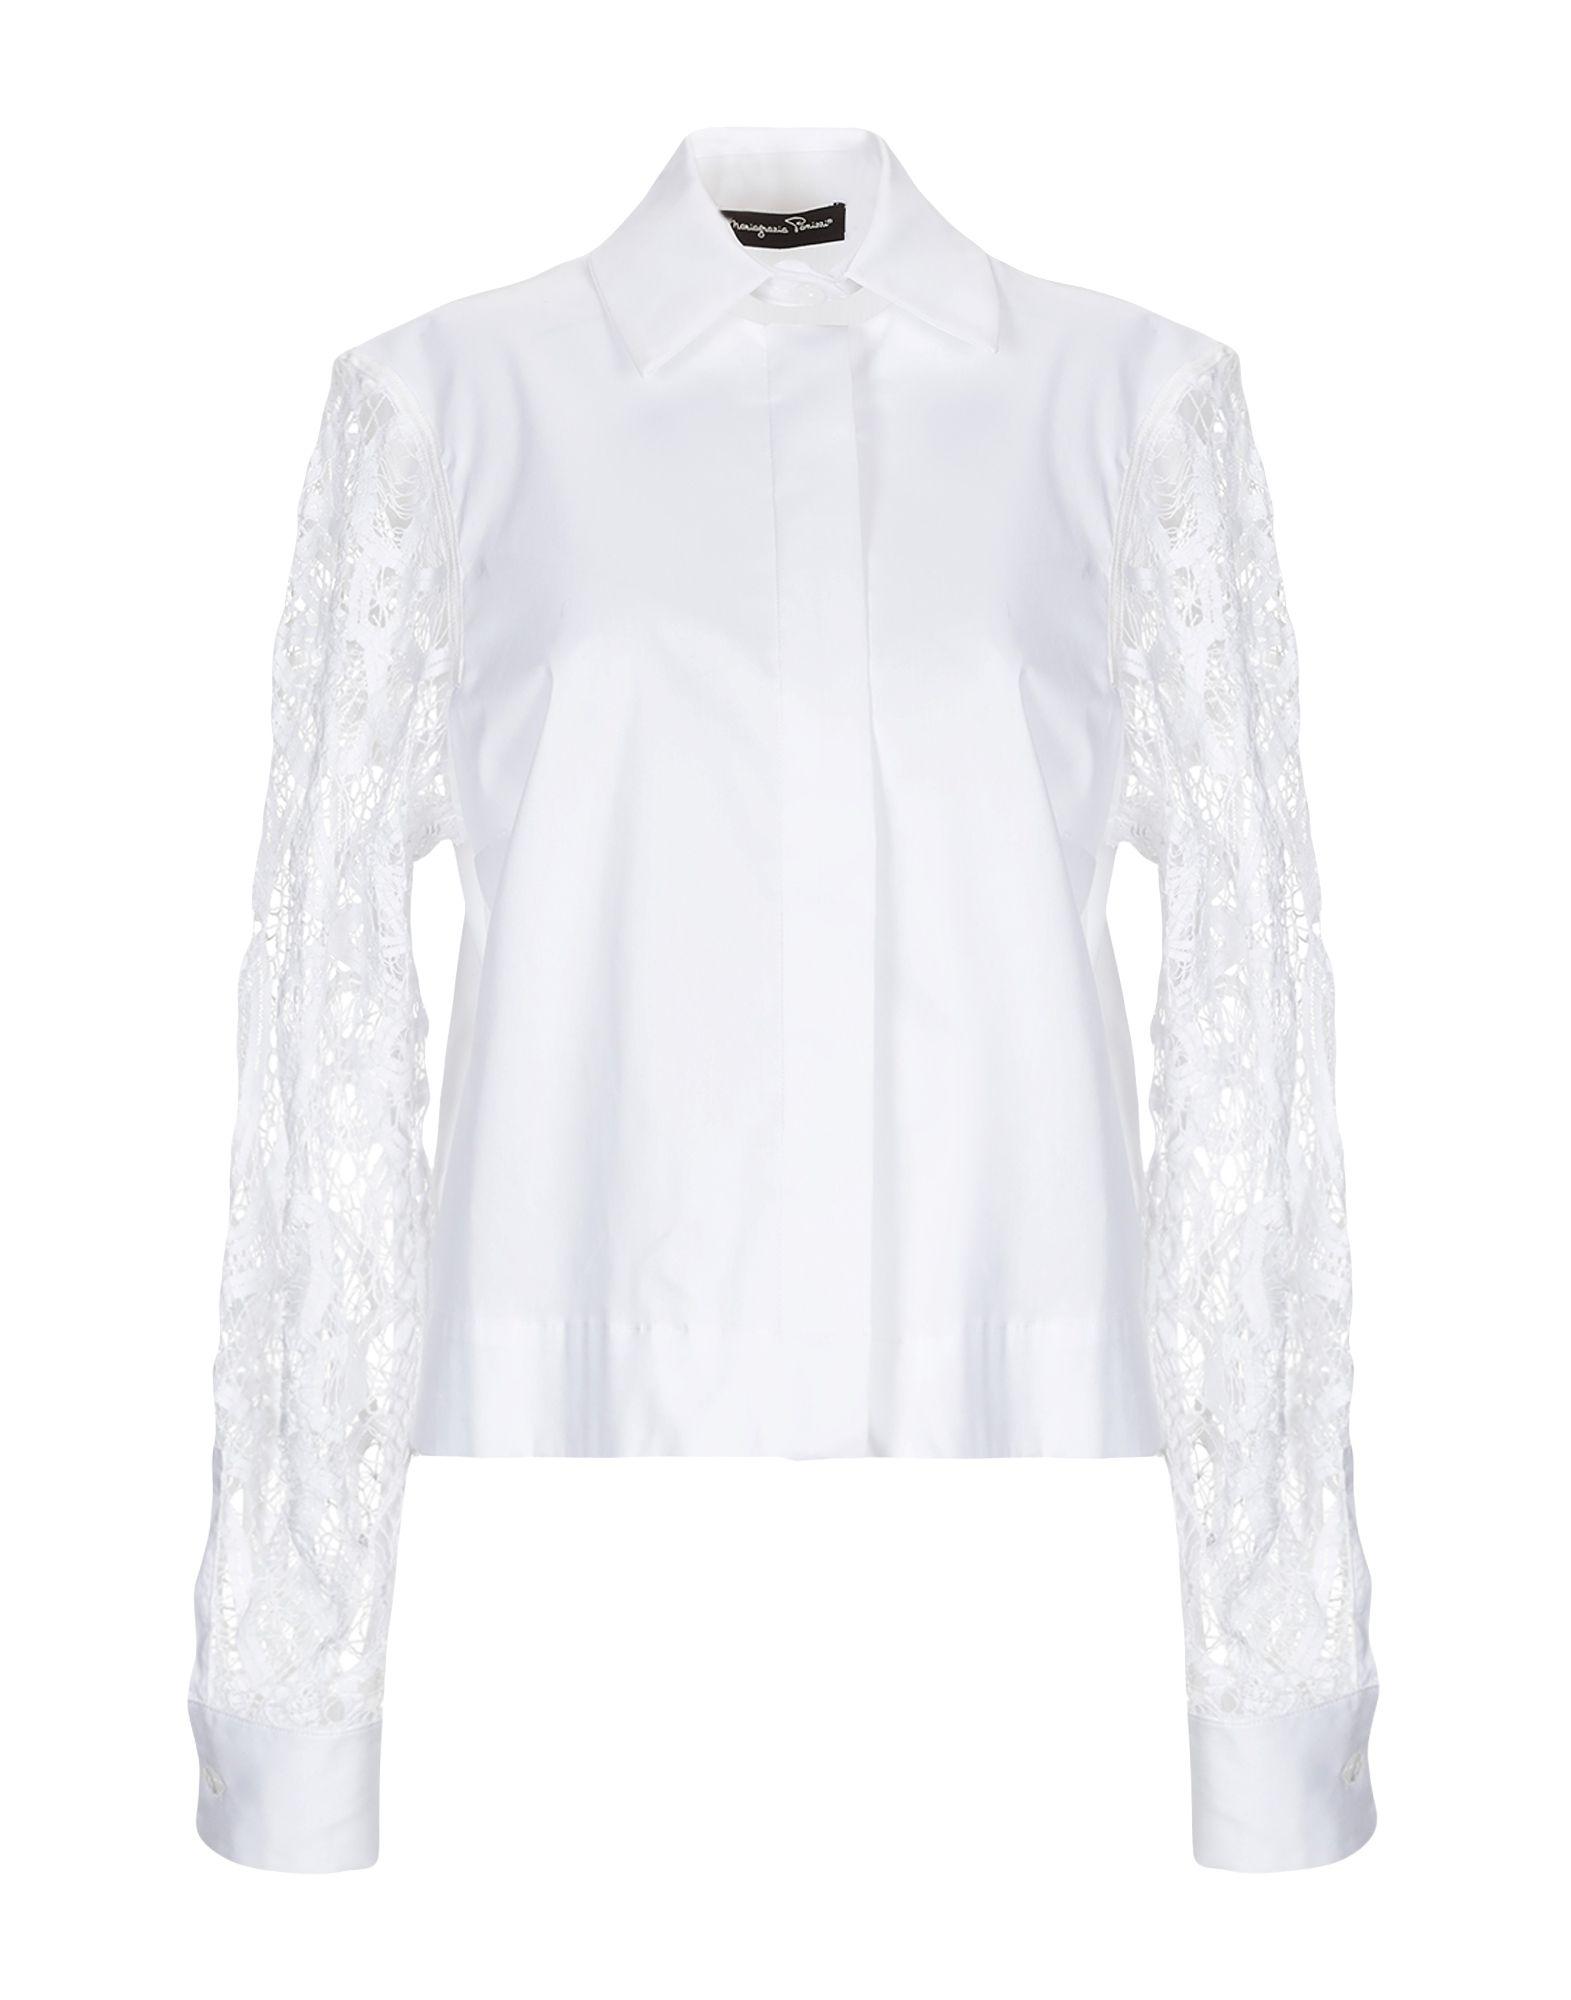 цены на MARIAGRAZIA PANIZZI Pубашка в интернет-магазинах